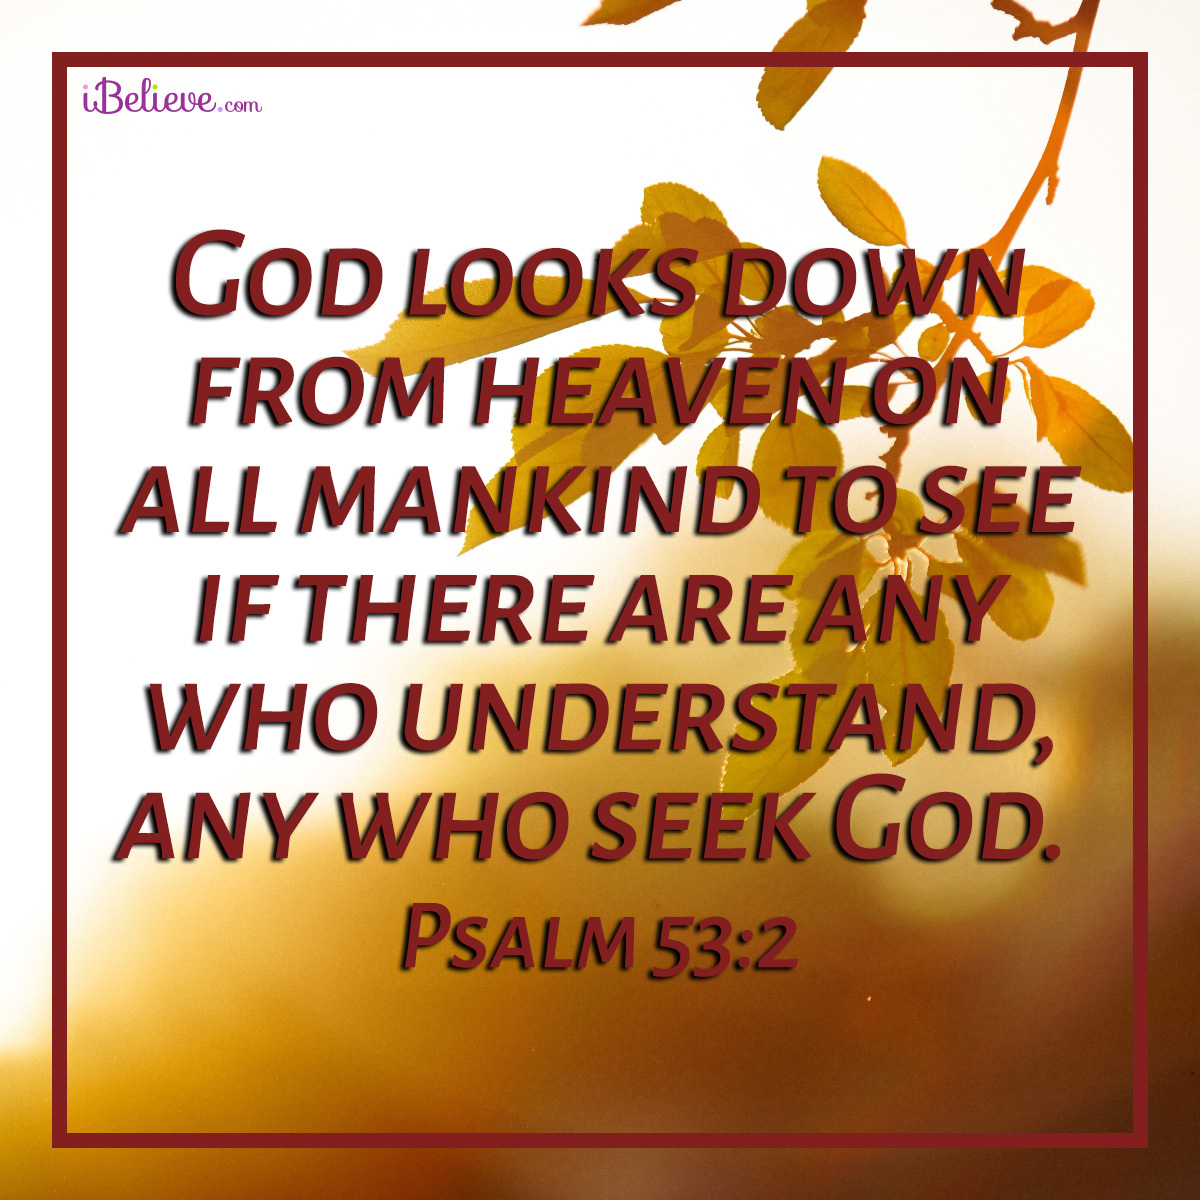 Psalm 53:2, inspirational image